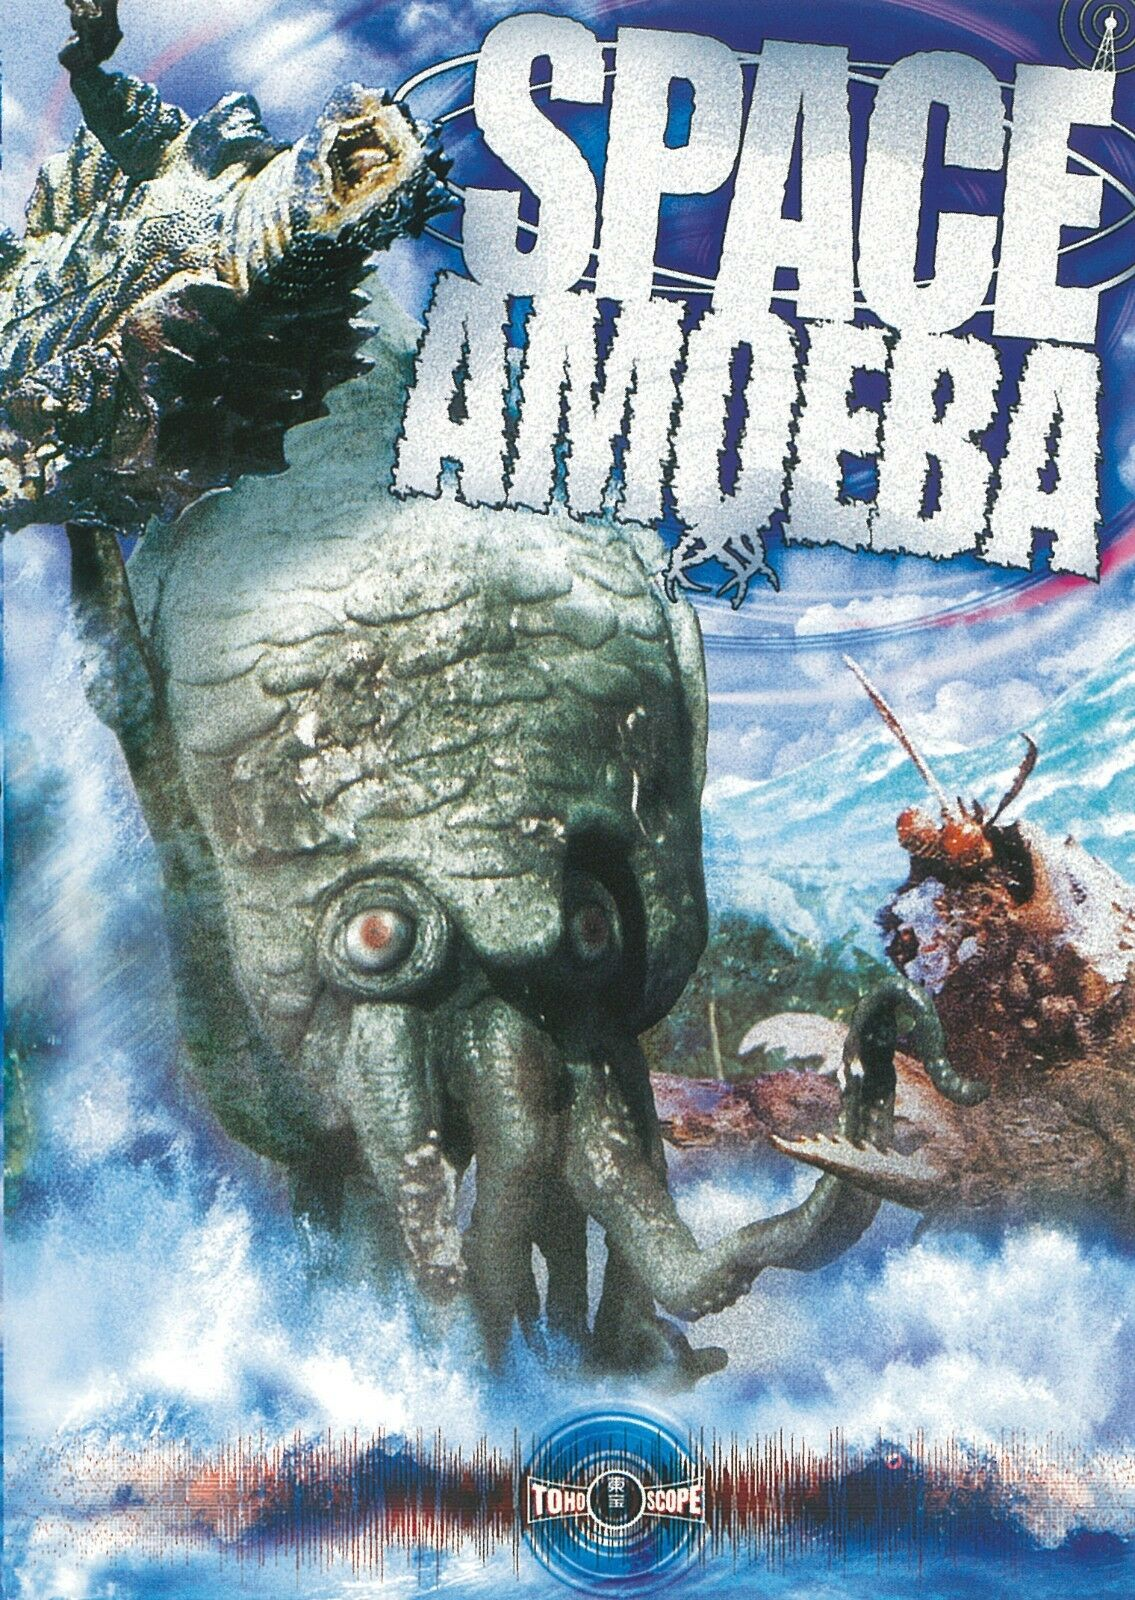 Space Amoeba (DVD, 2005)